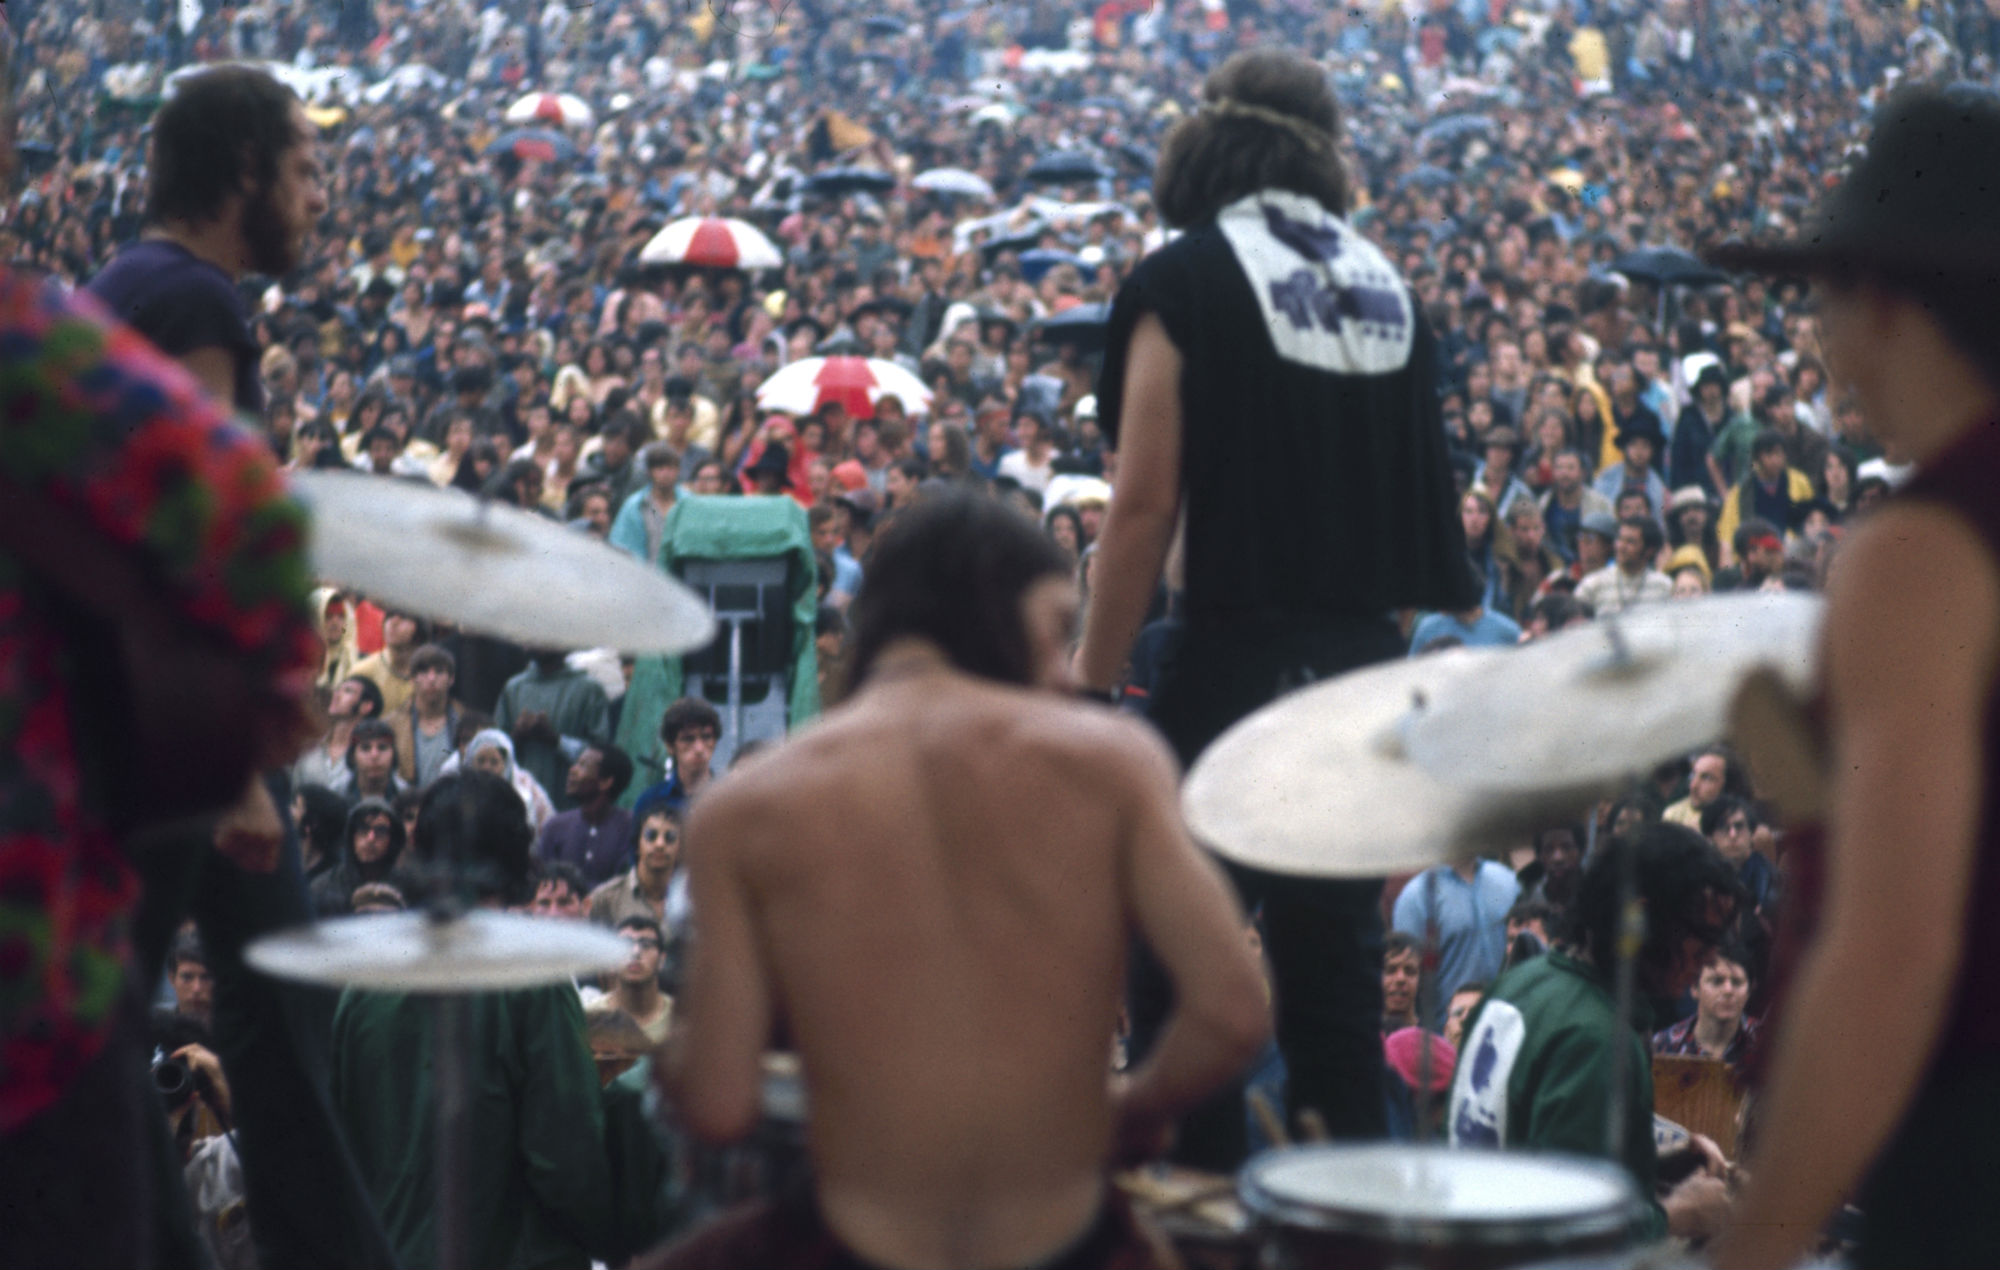 Country Joe & The Fish perform at Woodstock